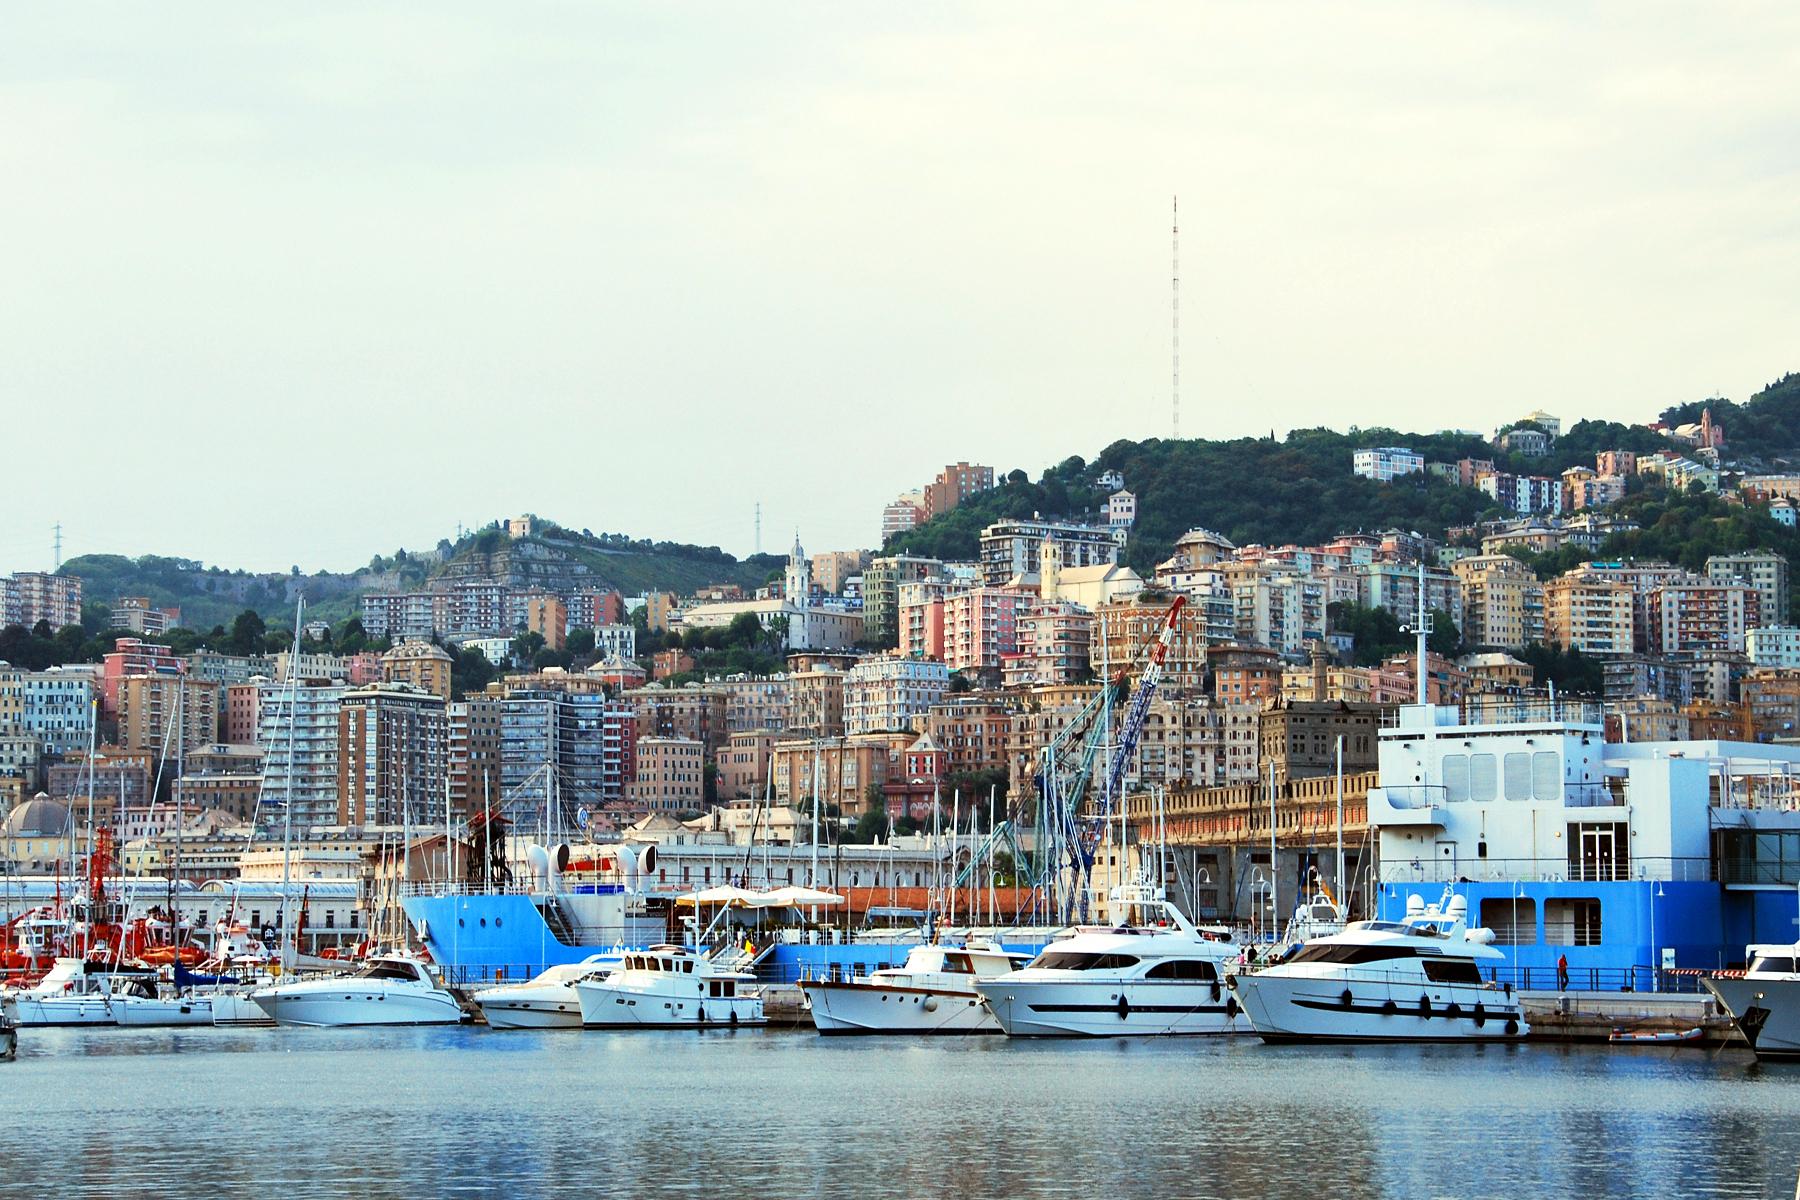 Genoa Italy Cruise Port Cruiseline Com